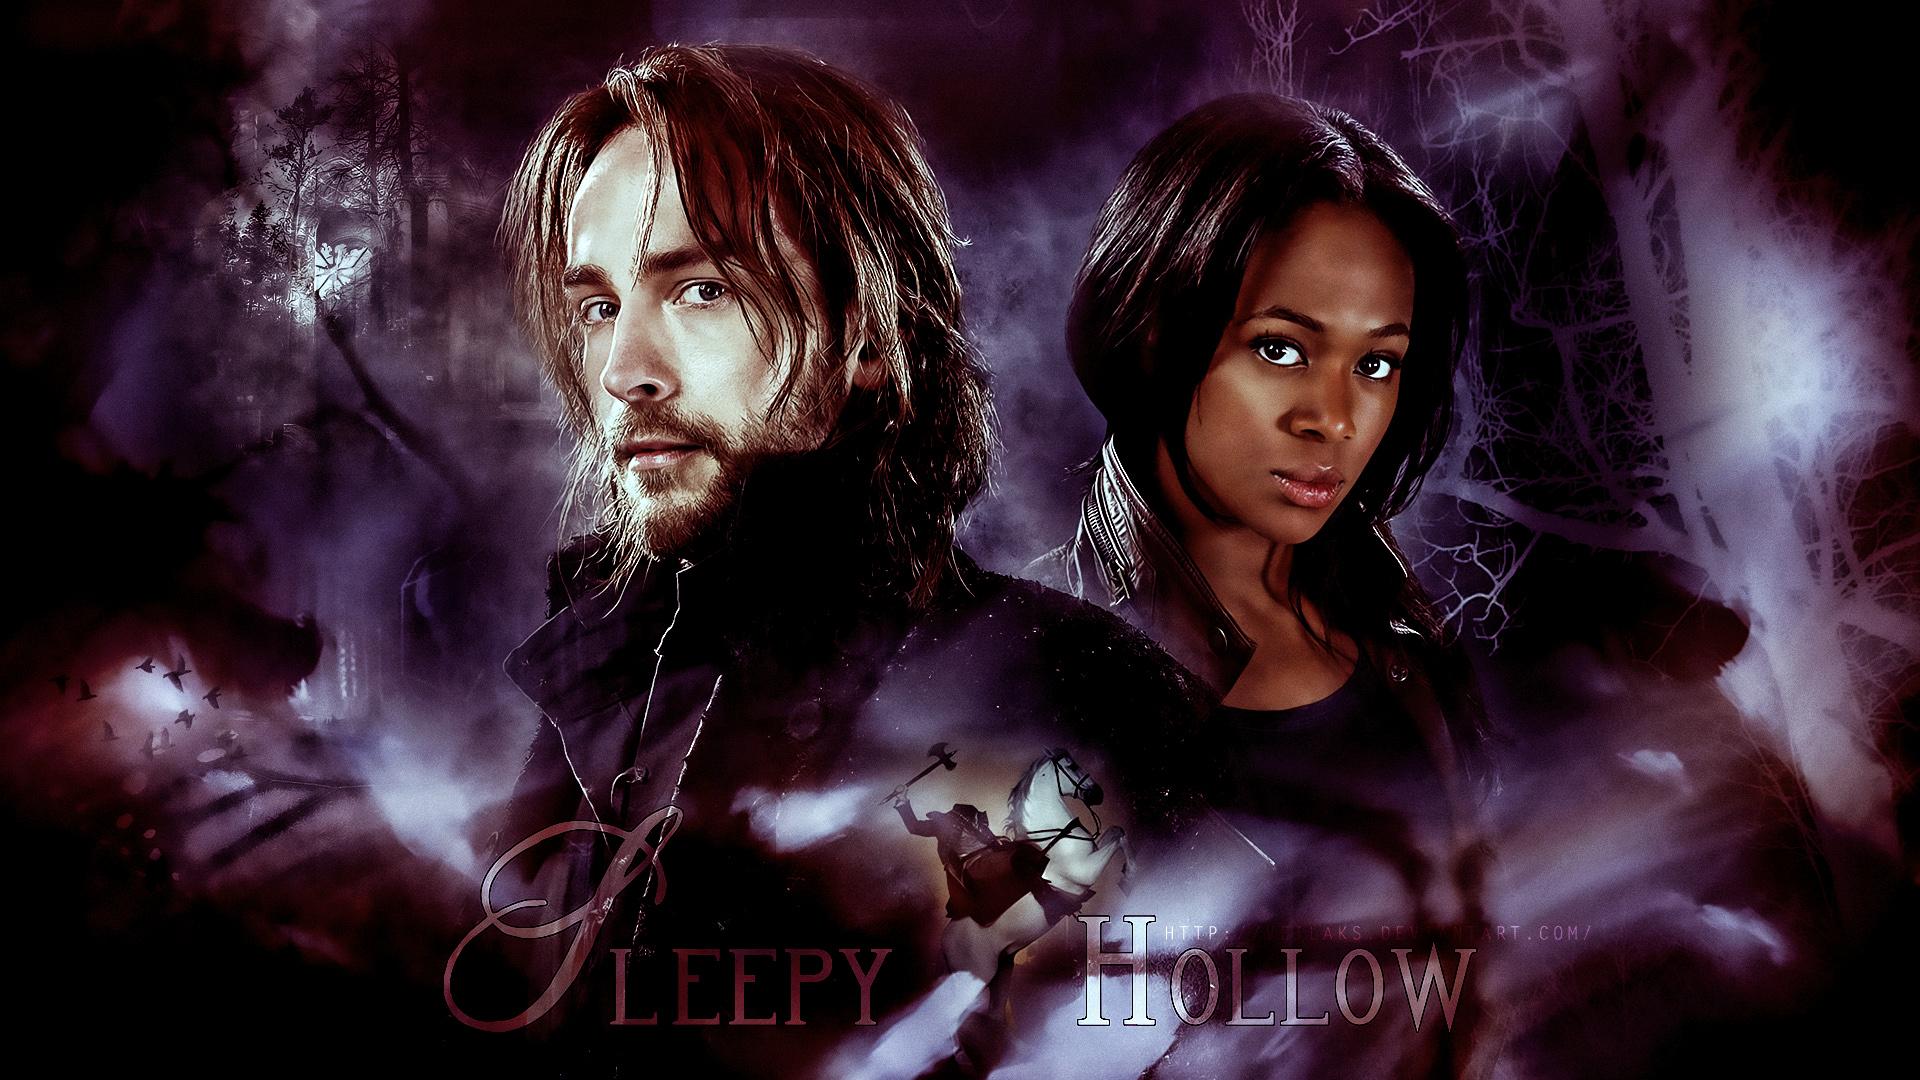 Sleepy Hollow.T.2� [Web-Dl 1080p][Dual+subt][1.7 Gb][ ZIPPY-UP-TF]